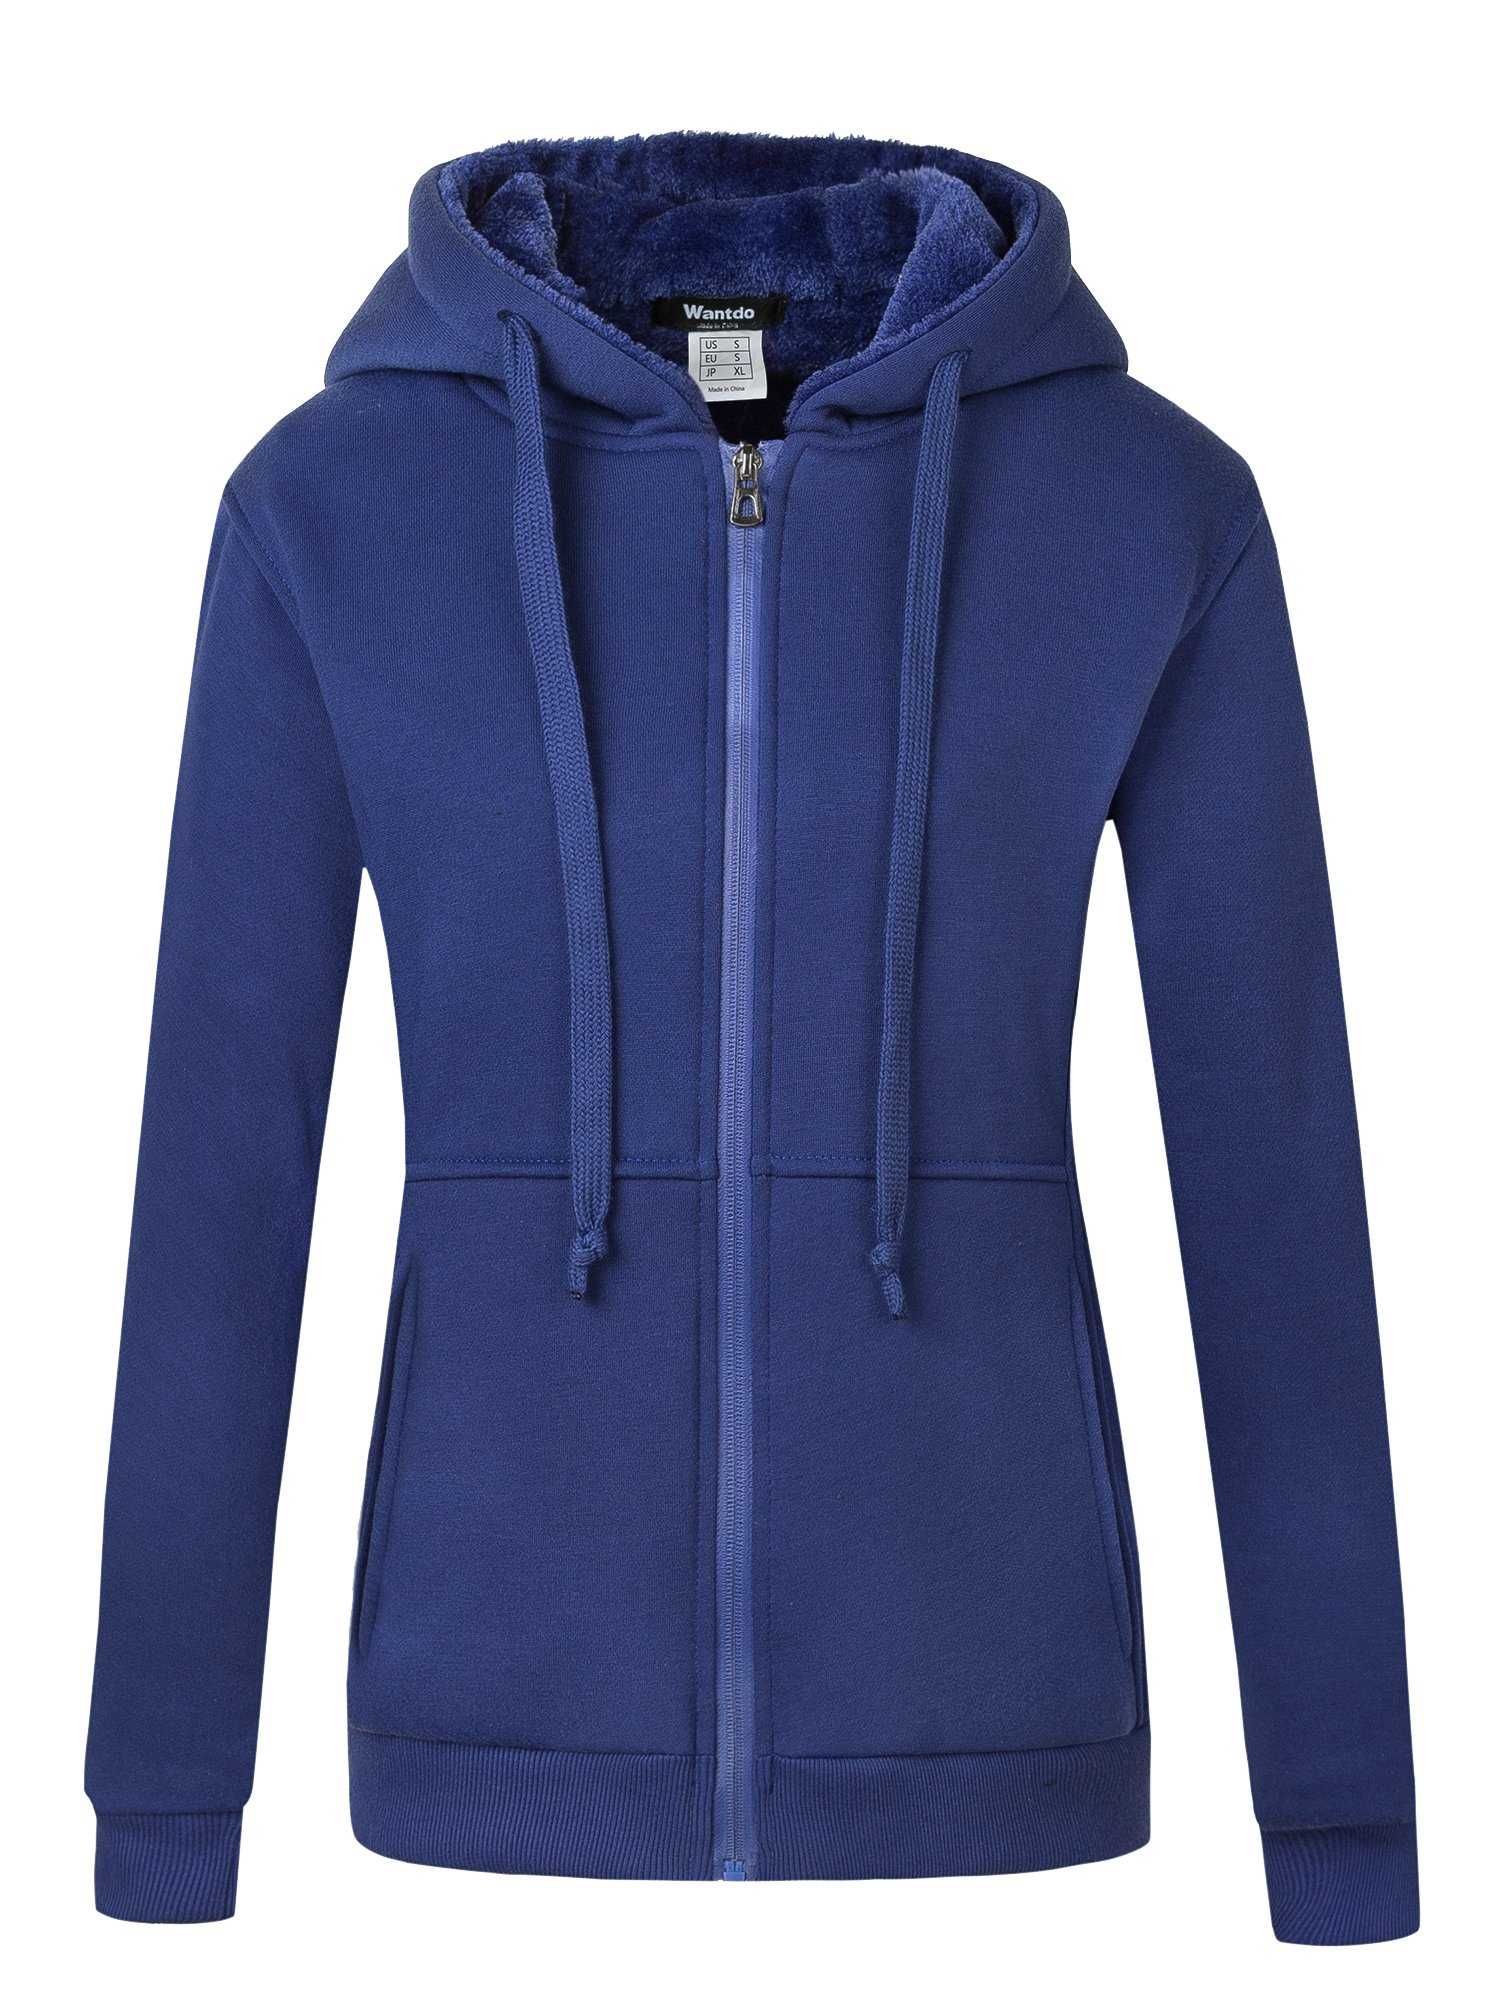 Wantdo Women's Warm Hoodie Sweatshirt Slim Fit Sherpa Lined Thick Zip Hooded Fleece Jacket Navy Large Navy Large